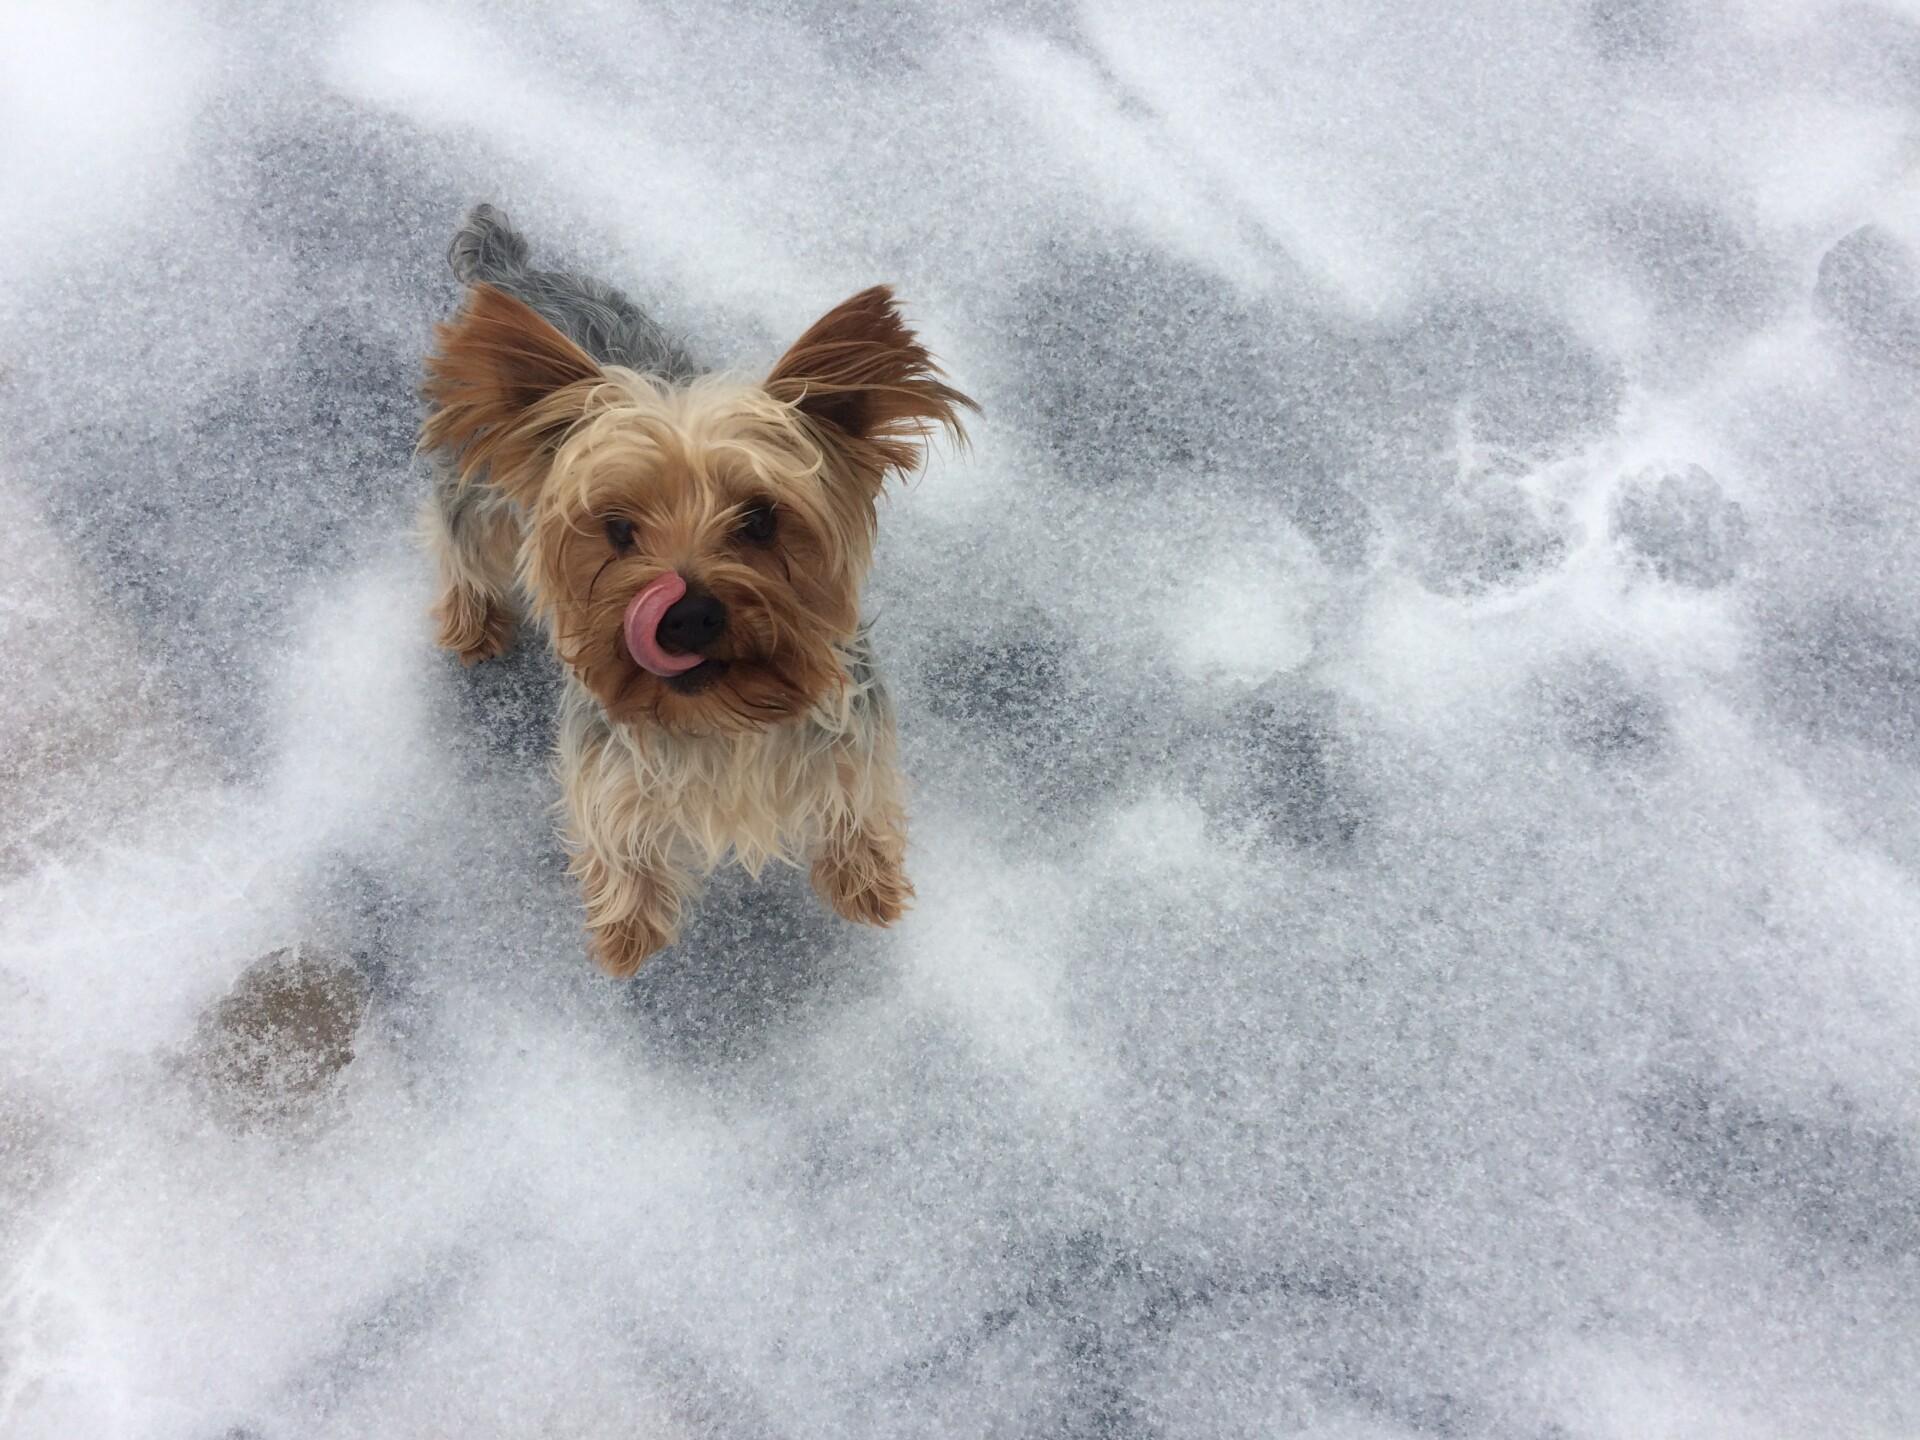 Photos: Share your snow photos! (Part2)